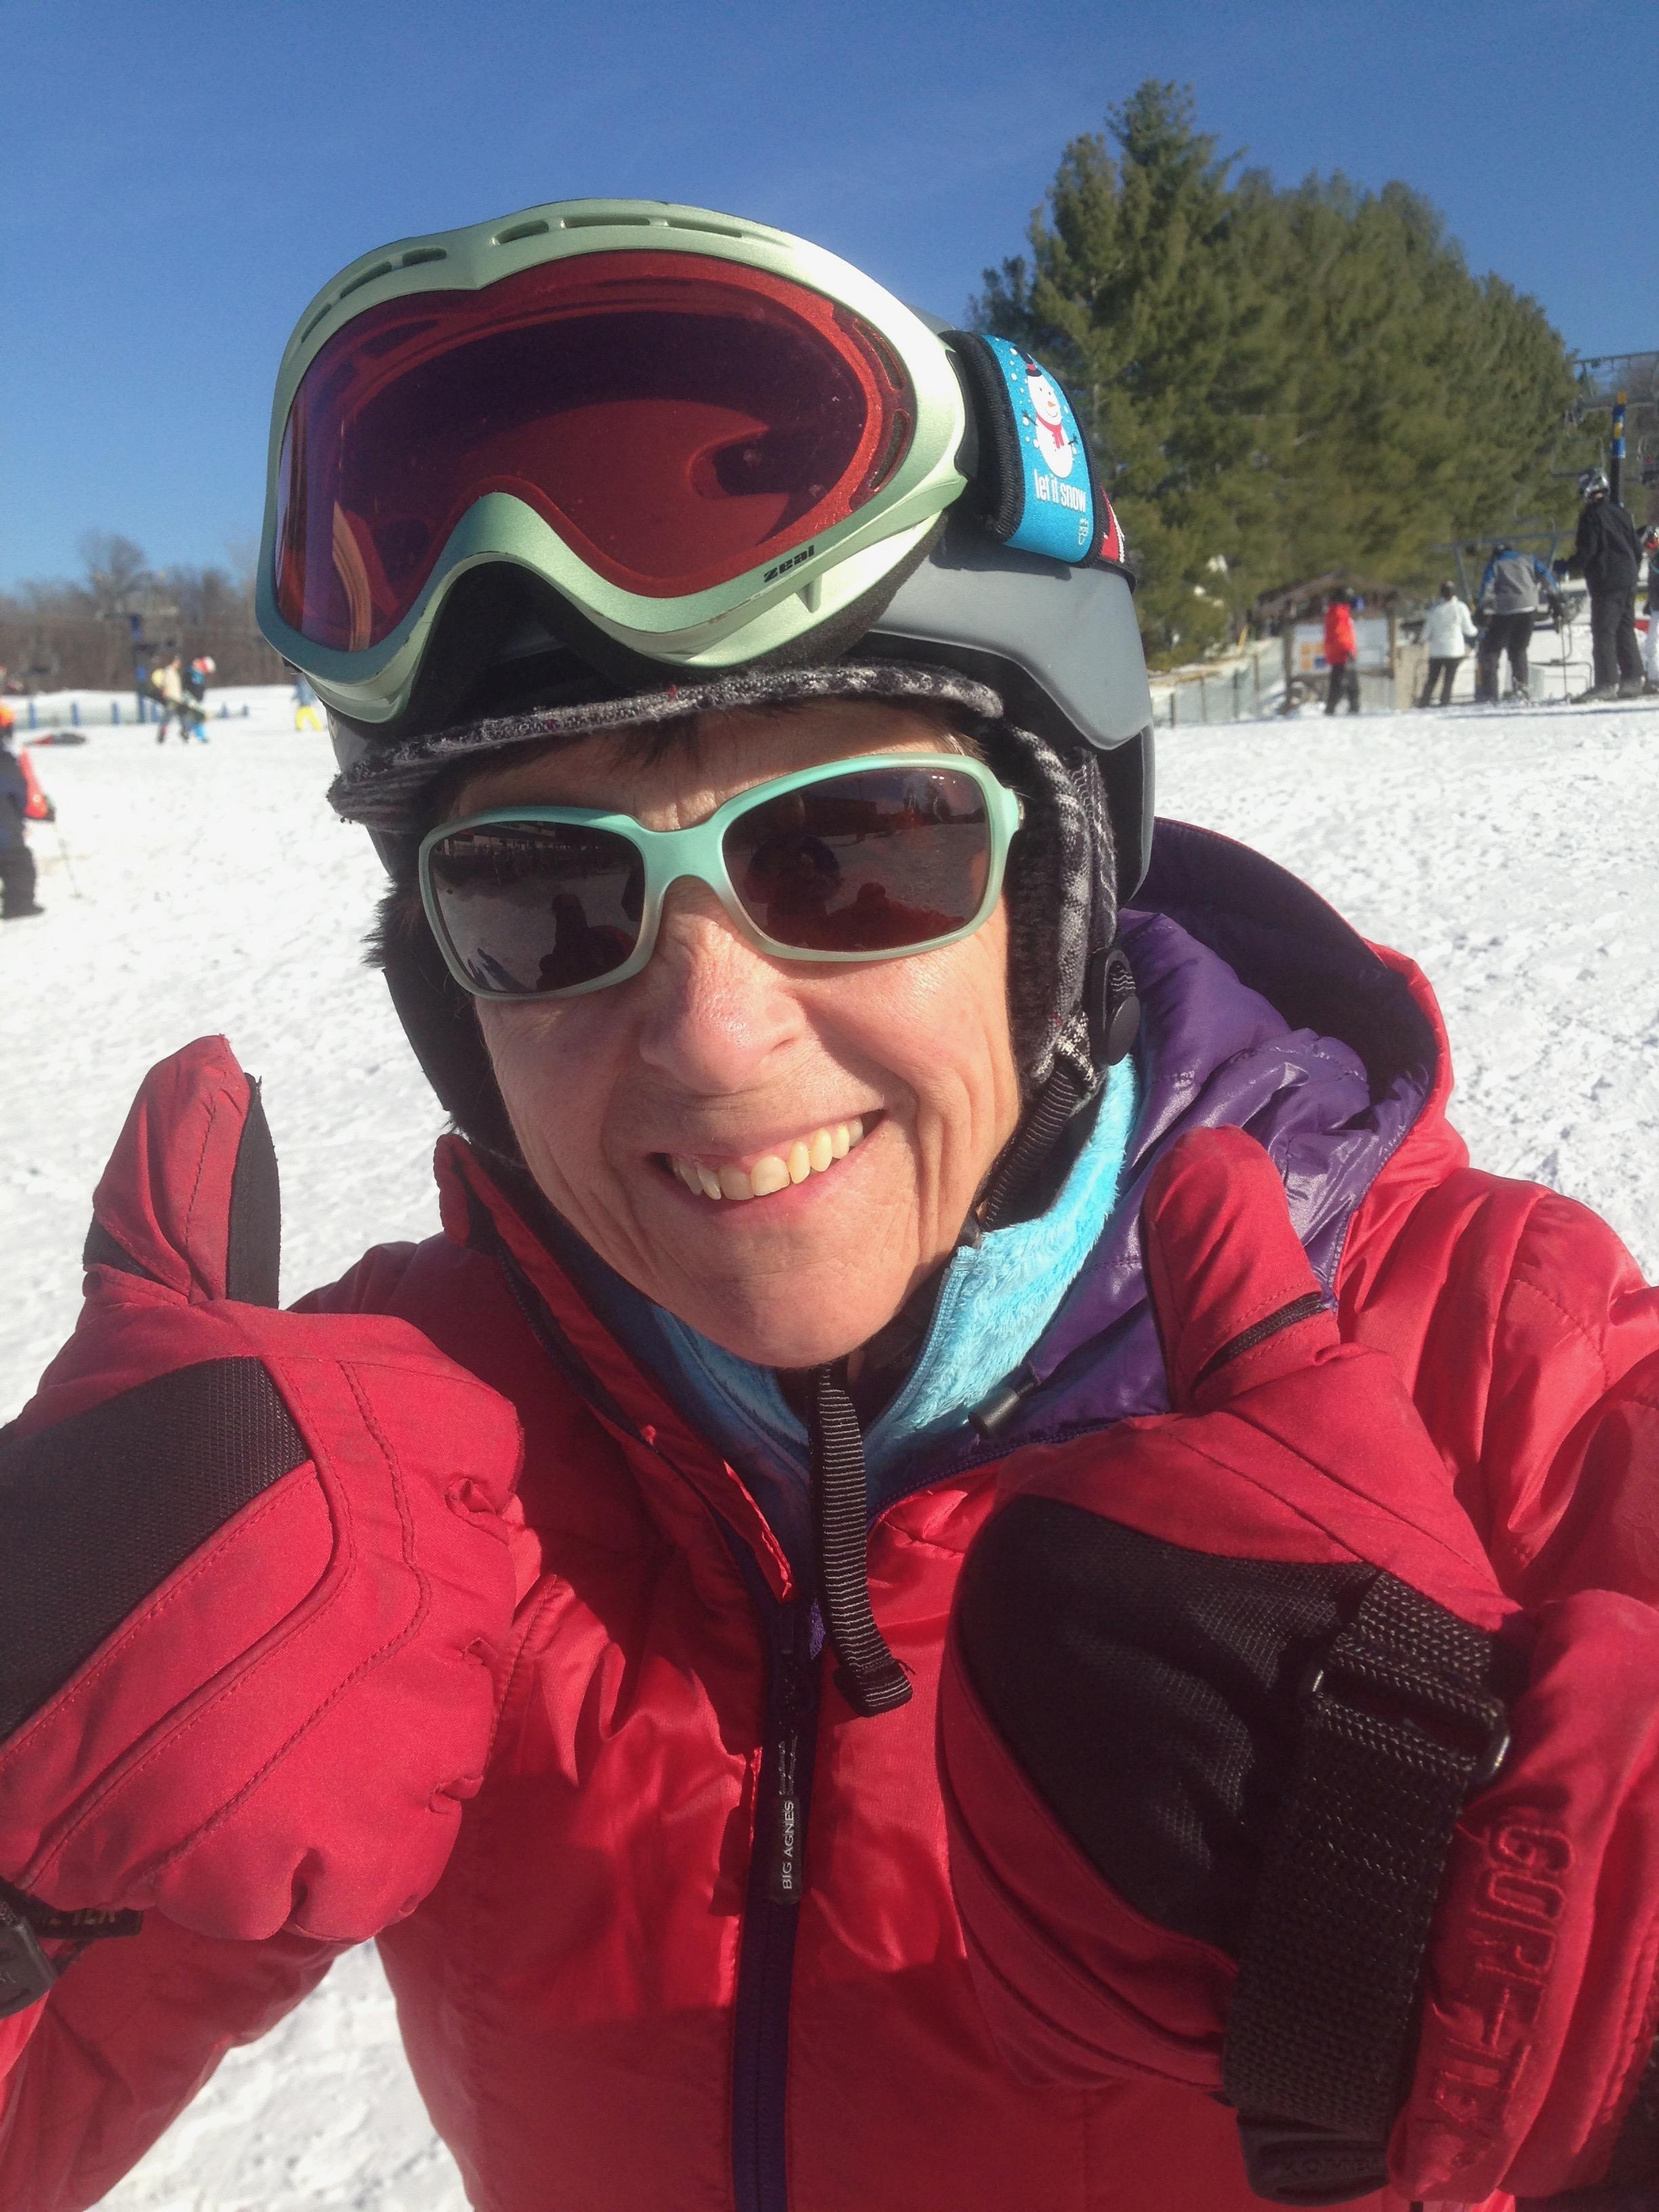 Mary Jo tarallo , Executive director, learn to ski and snowboard/bring a friend initiative